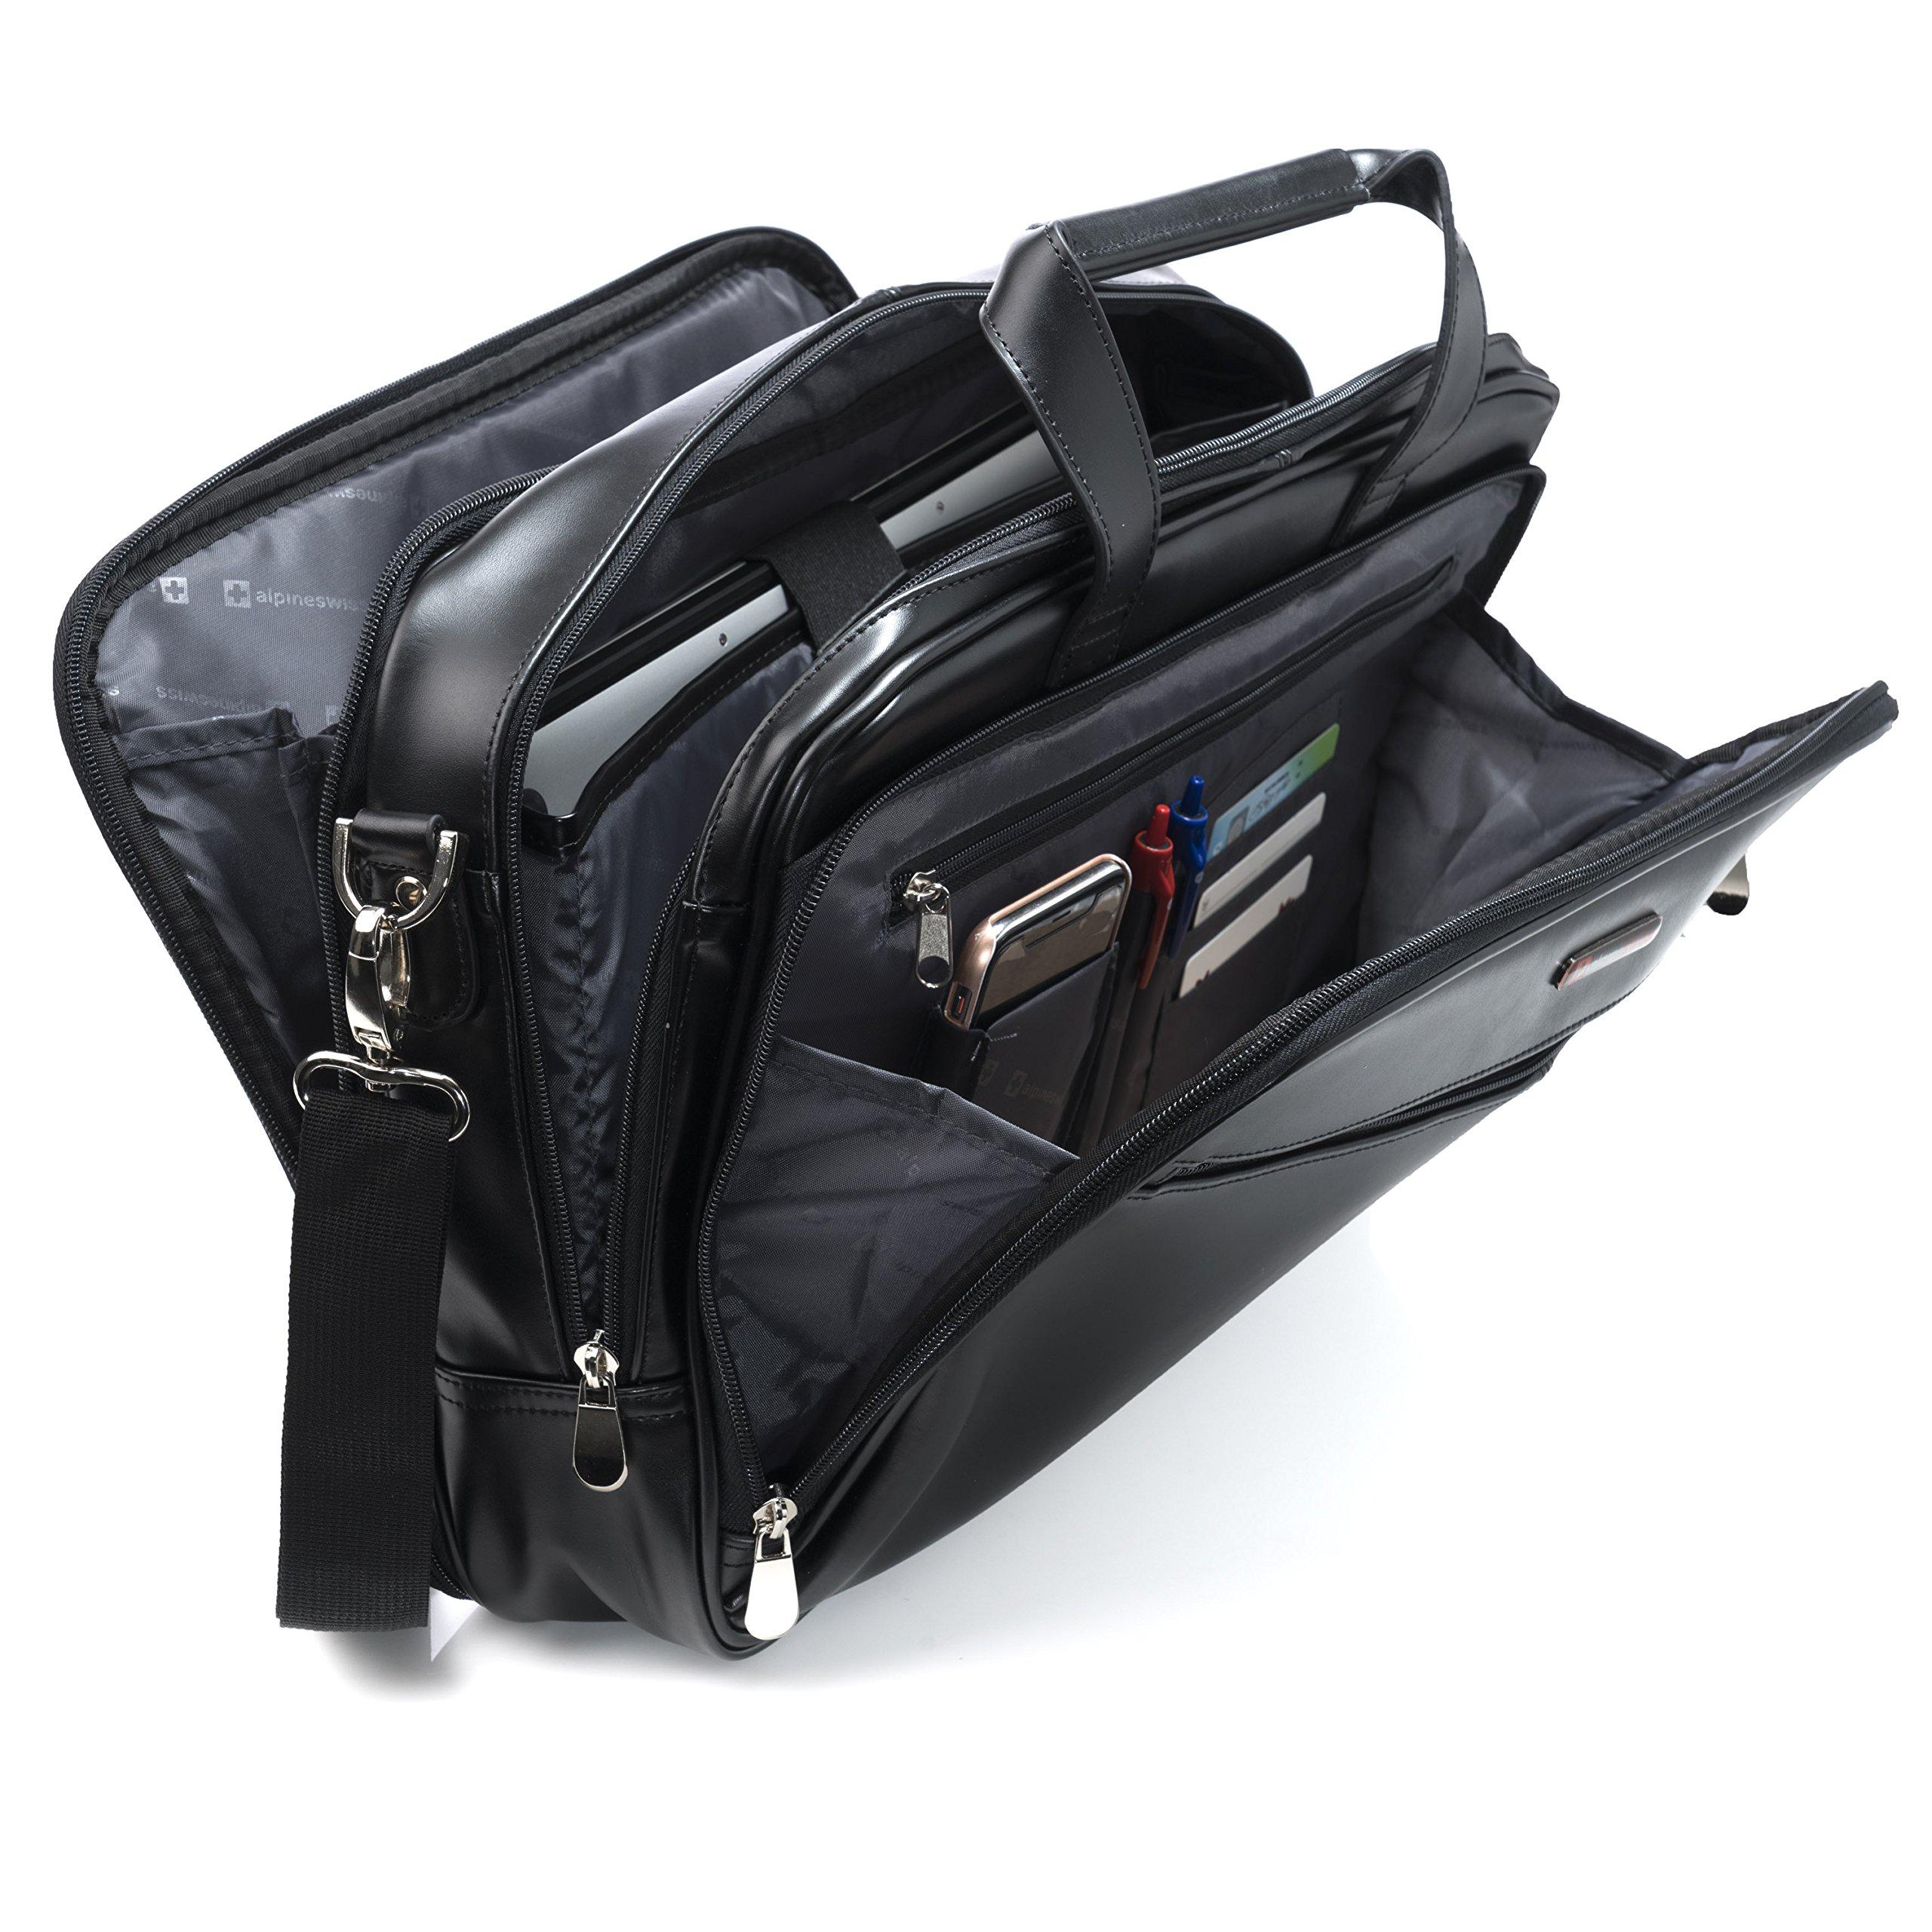 Alpine Swiss Monroe Leather Briefcase Top-Zip Laptop Messenger Bag Black by alpine swiss (Image #2)